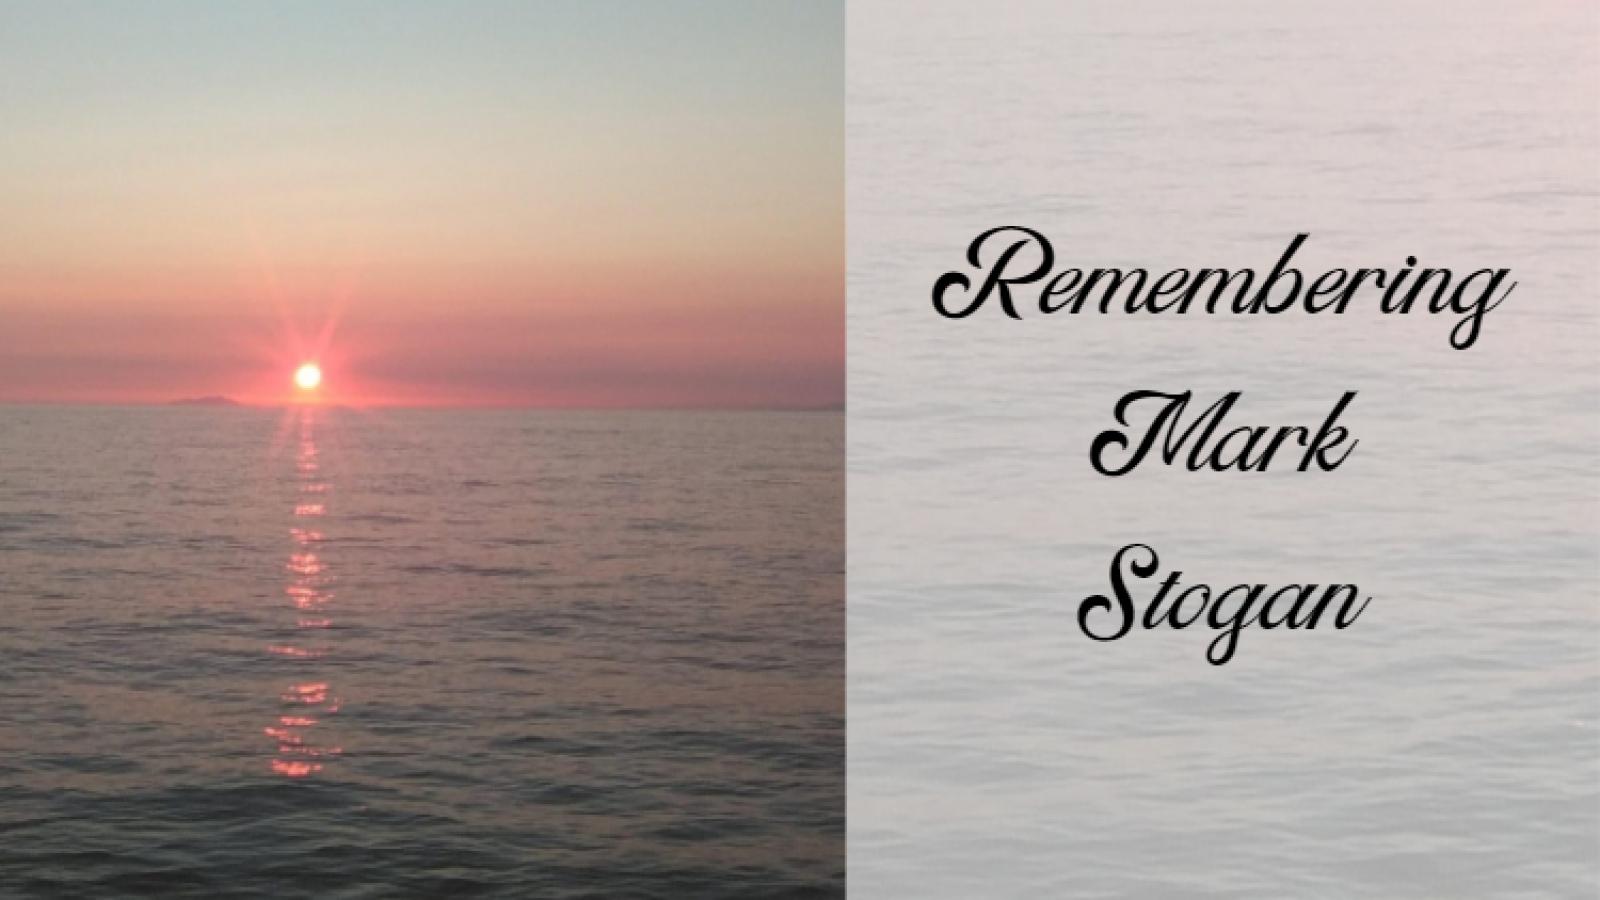 Remembering Mark Stogan